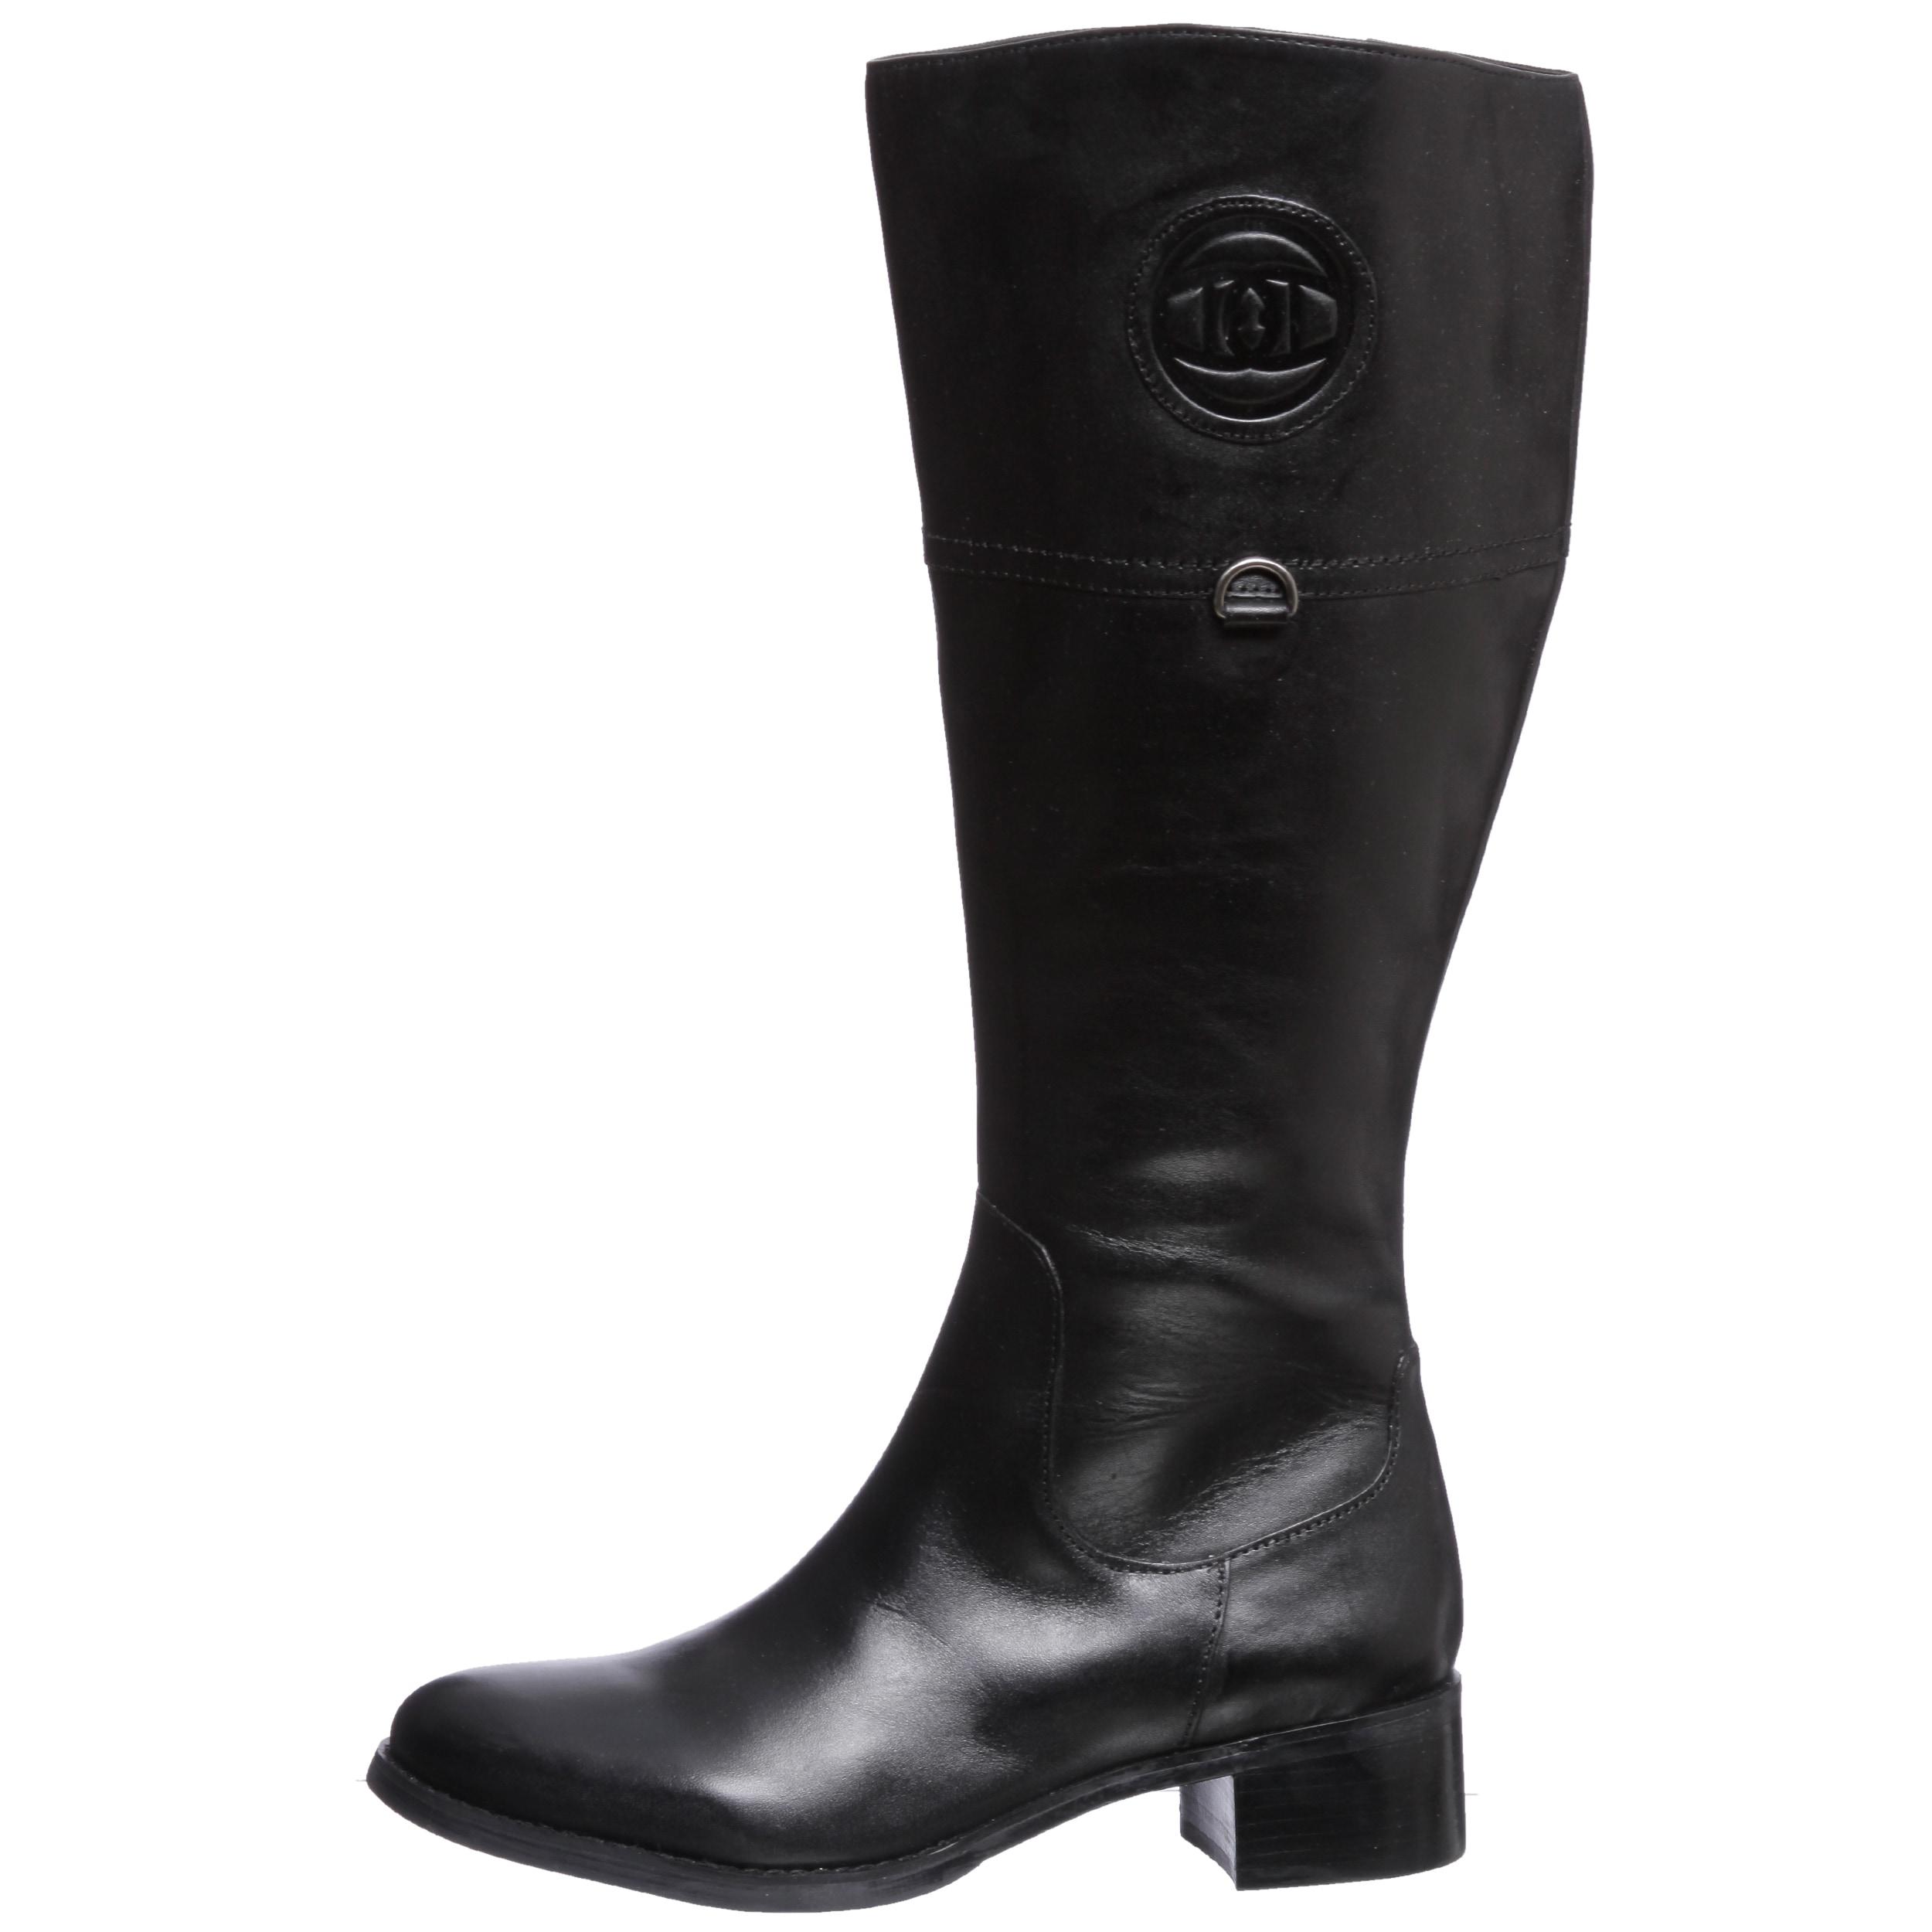 79c918ea06fd9 Shop Etienne Aigner  Chastity  Black Leather Riding Boots - Free ...